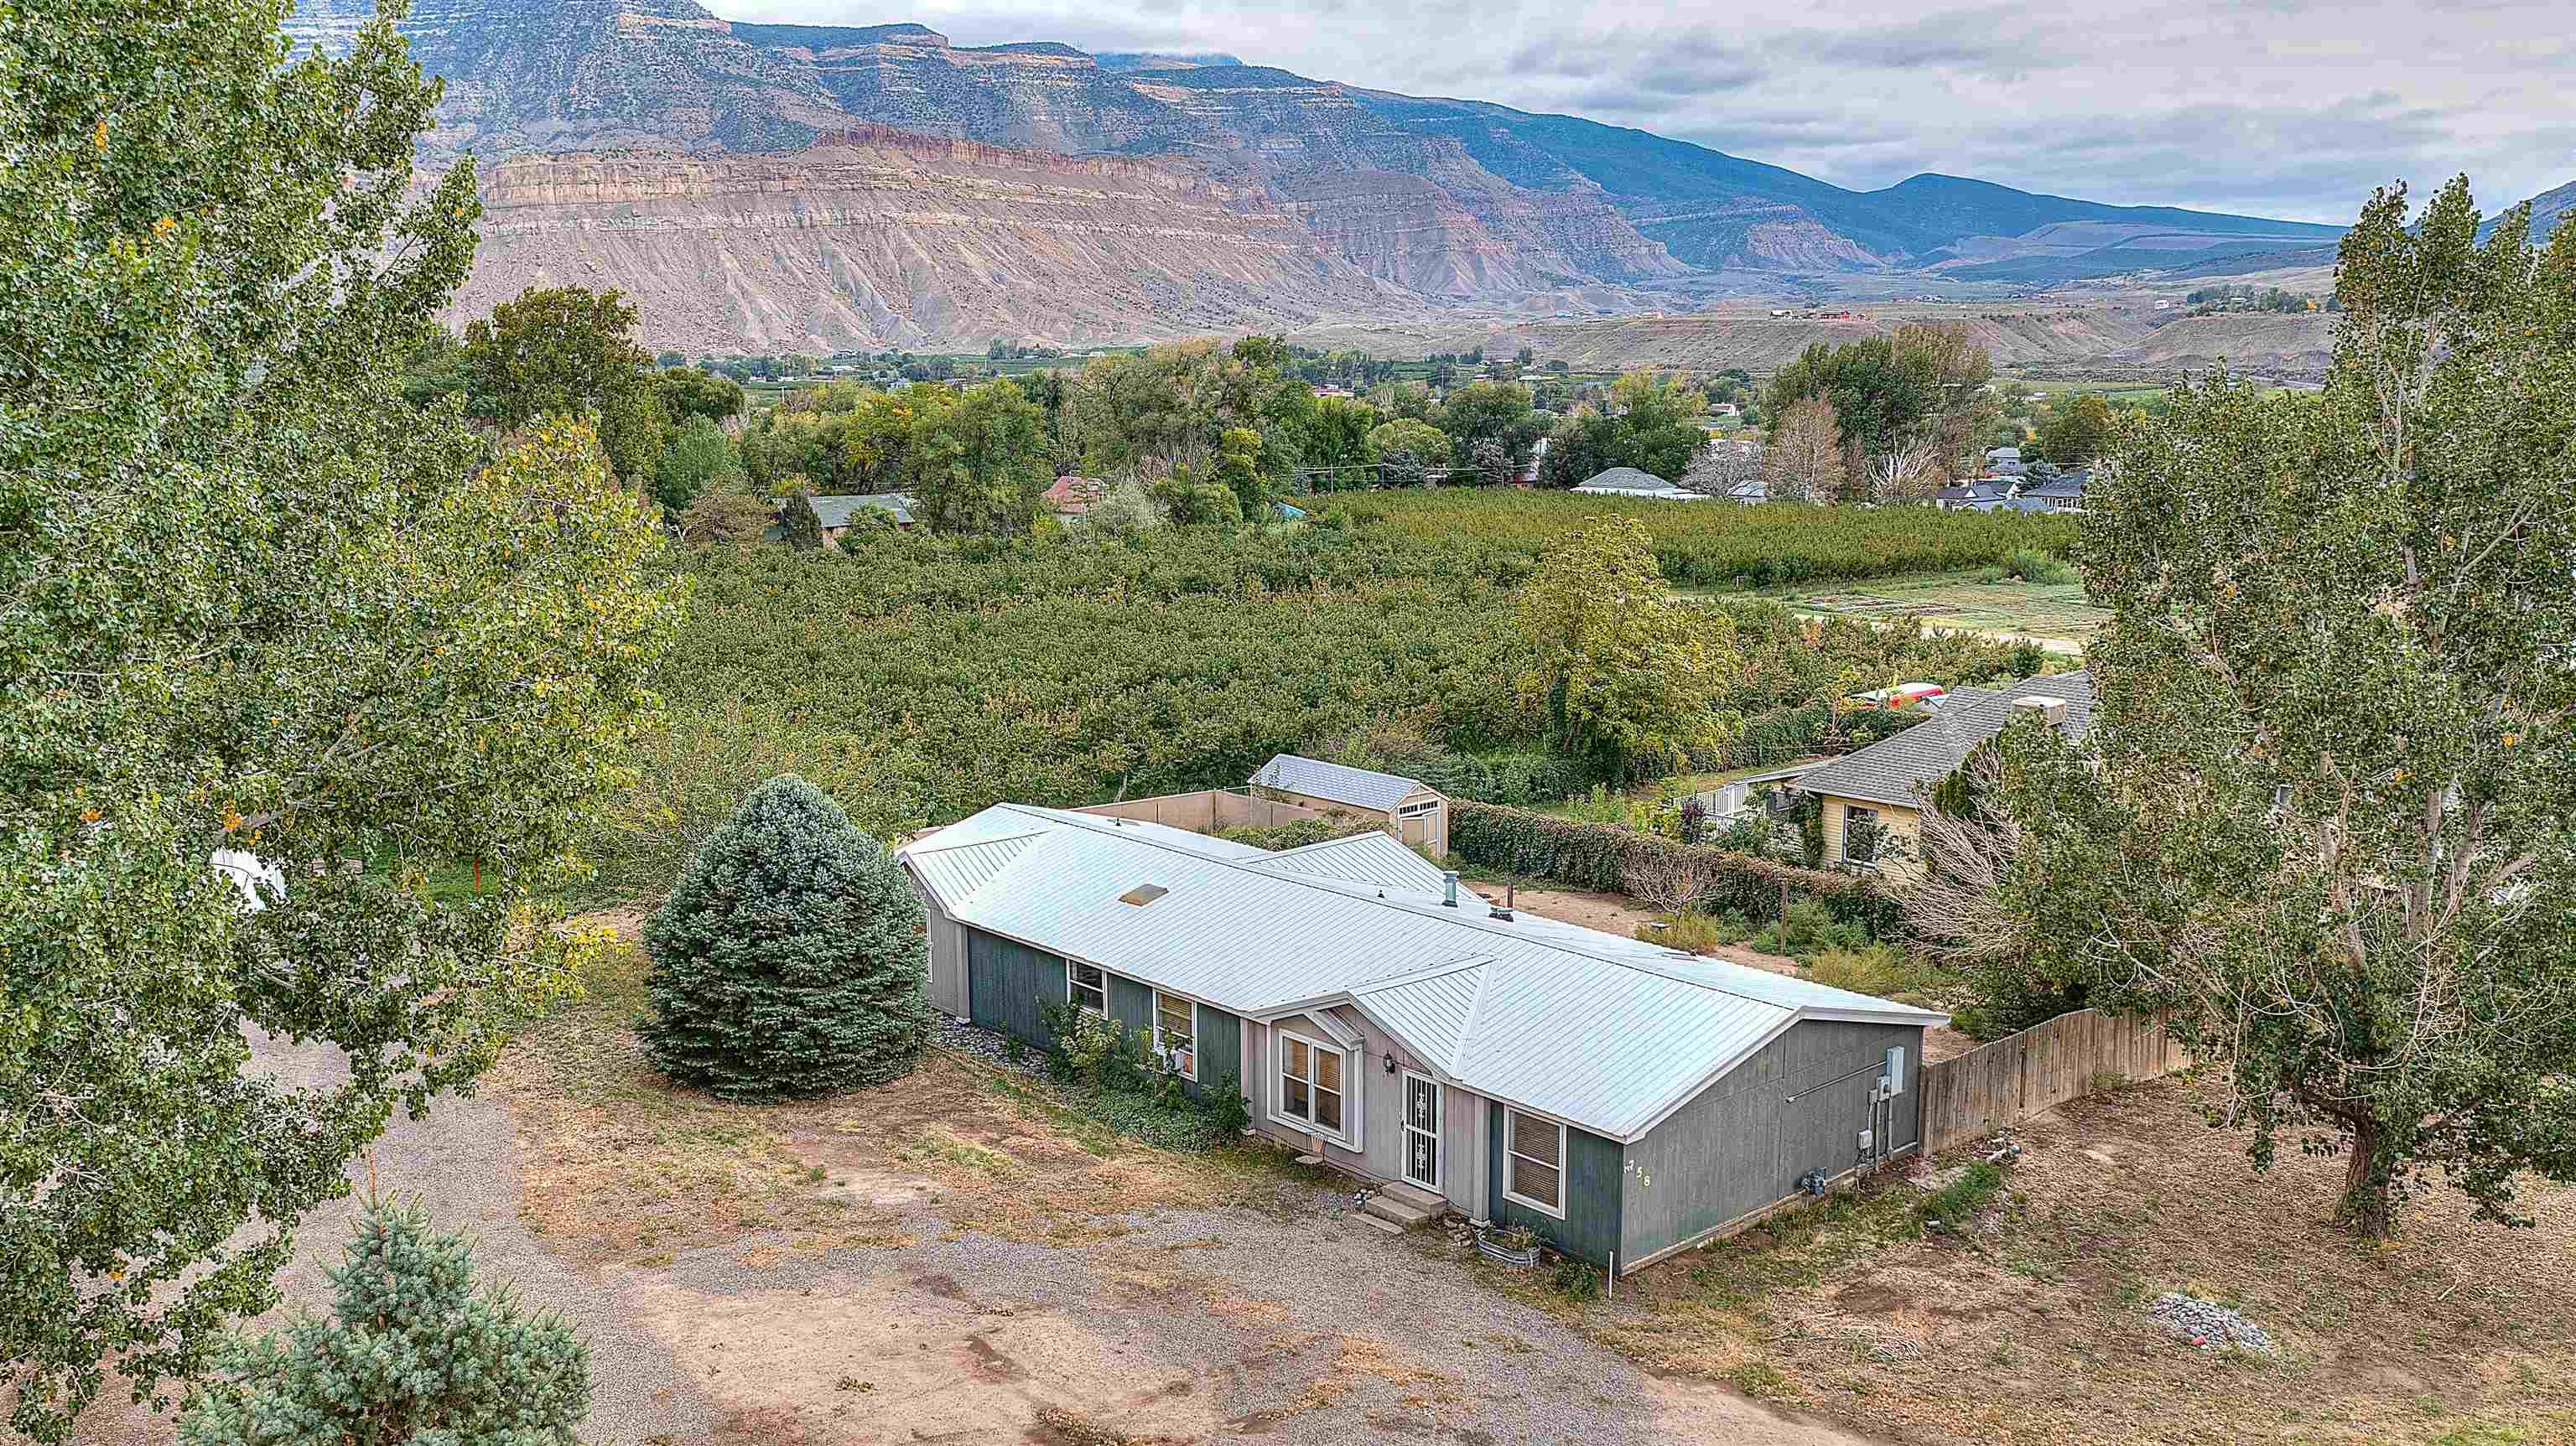 758 37 8/10 Road Property Photo 28